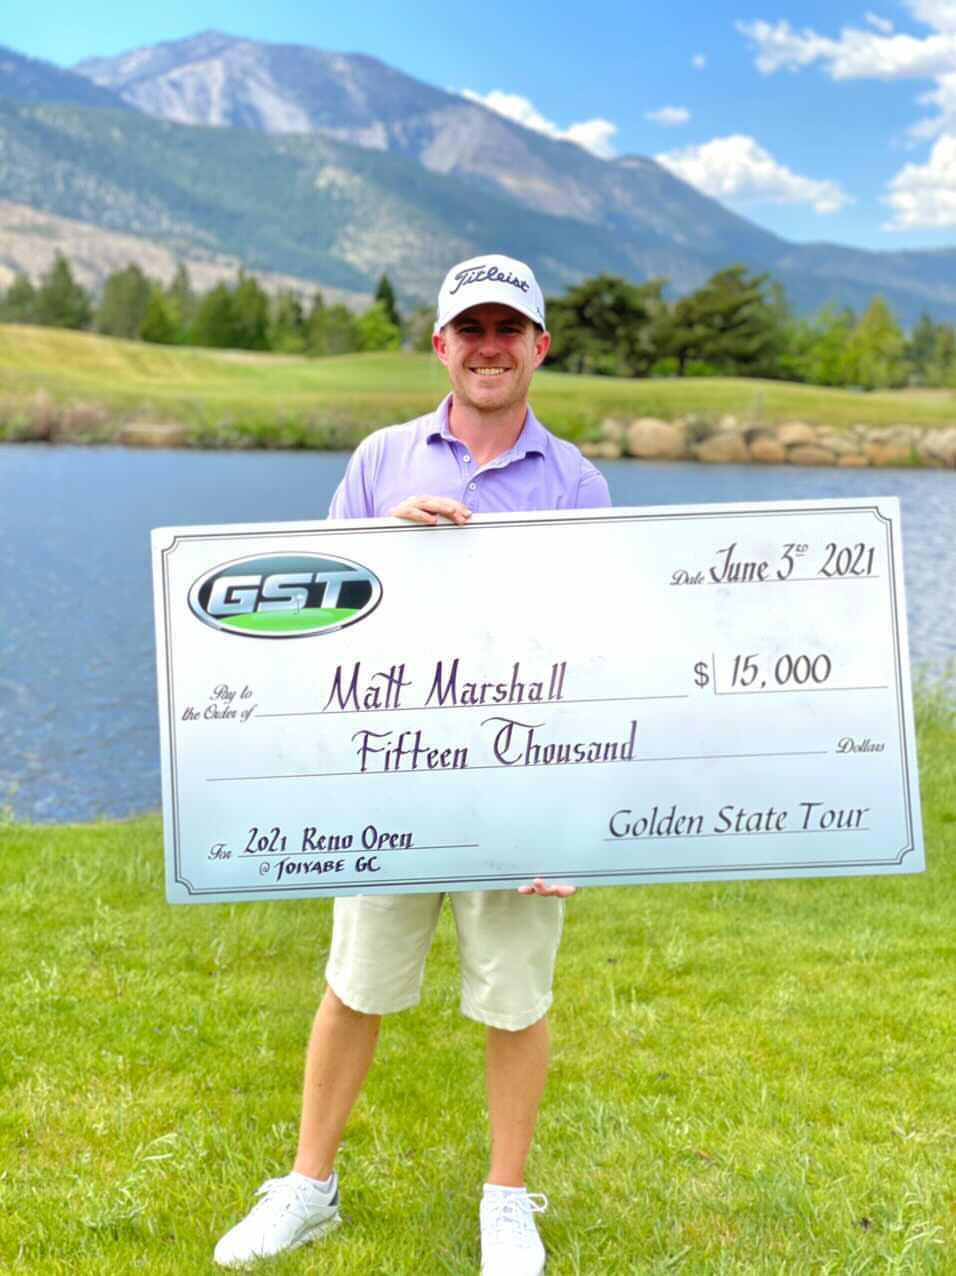 Reno Open 2021 Winner - Matt Marshall